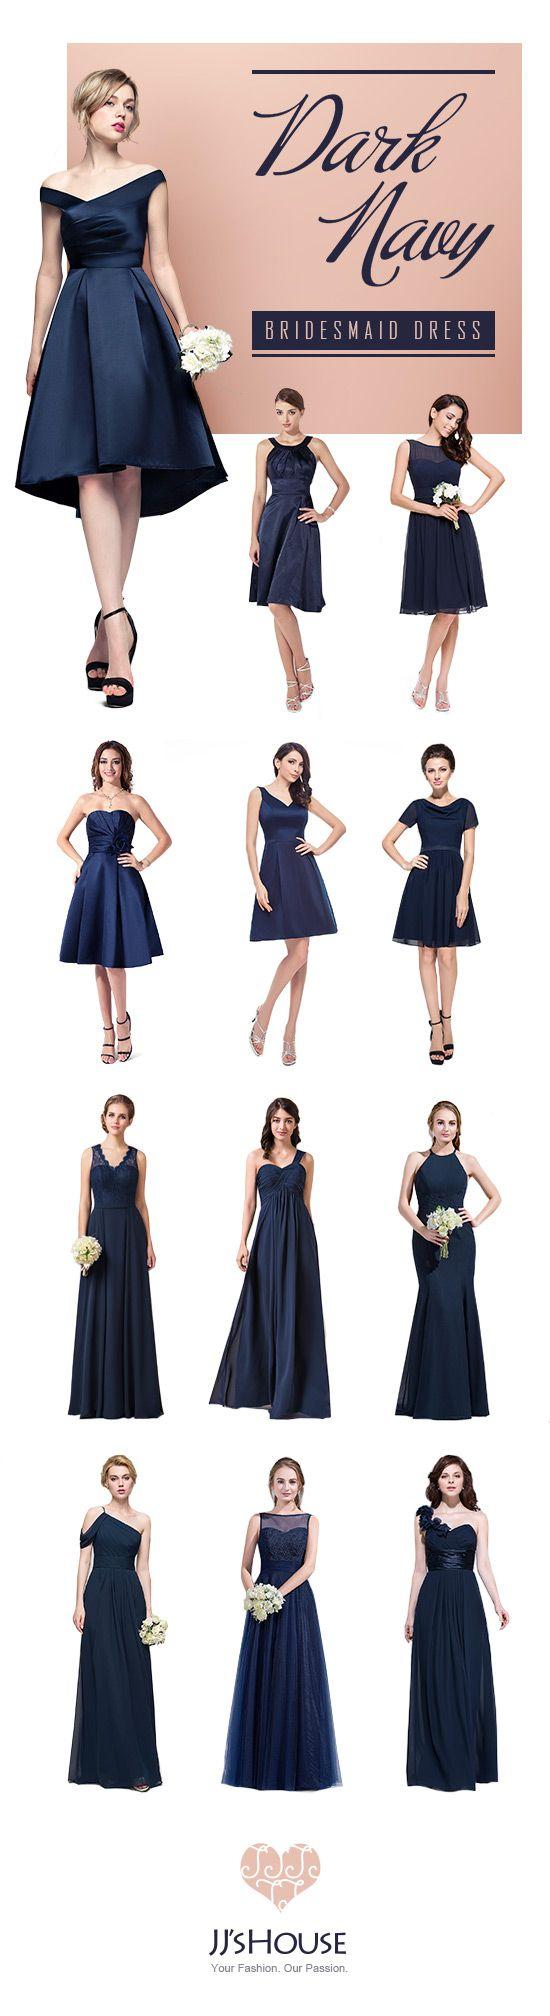 Dark navy bridesmaid dress bridesmaiddress bridesmaids